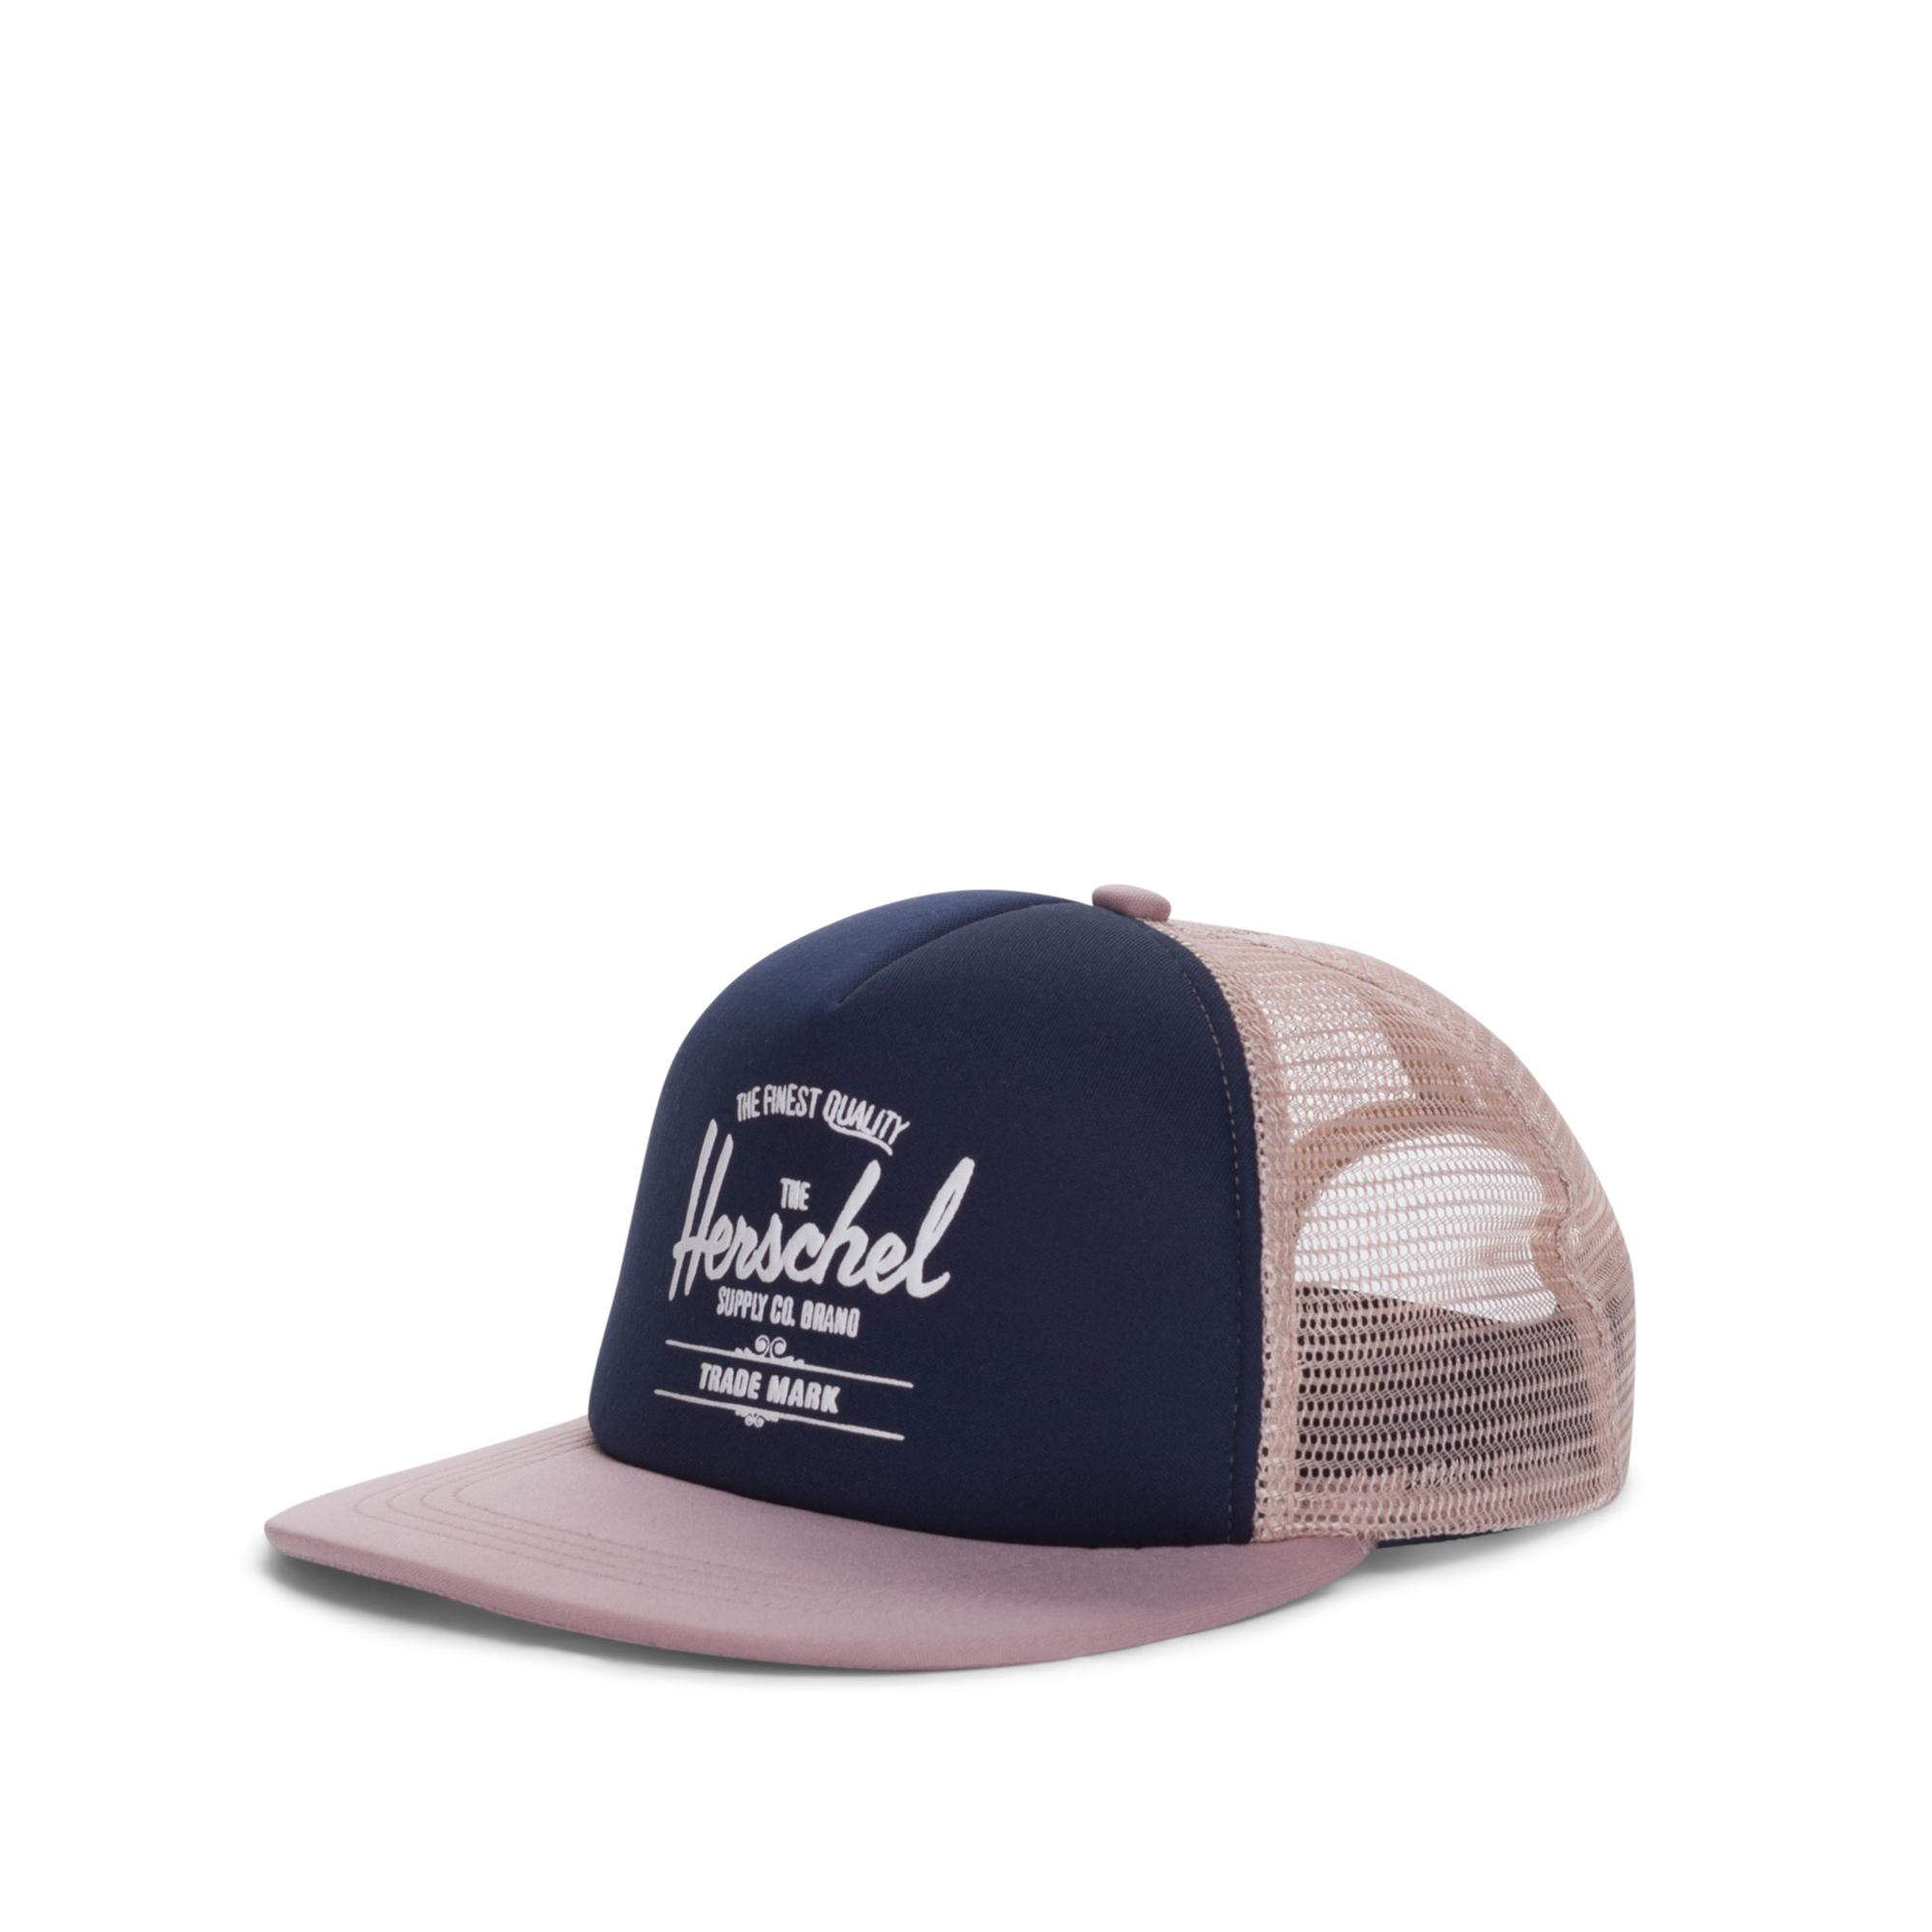 09589f0c5cc50 ... sale kids hats caps and beanies herschel supply company 7f0e1 556bb